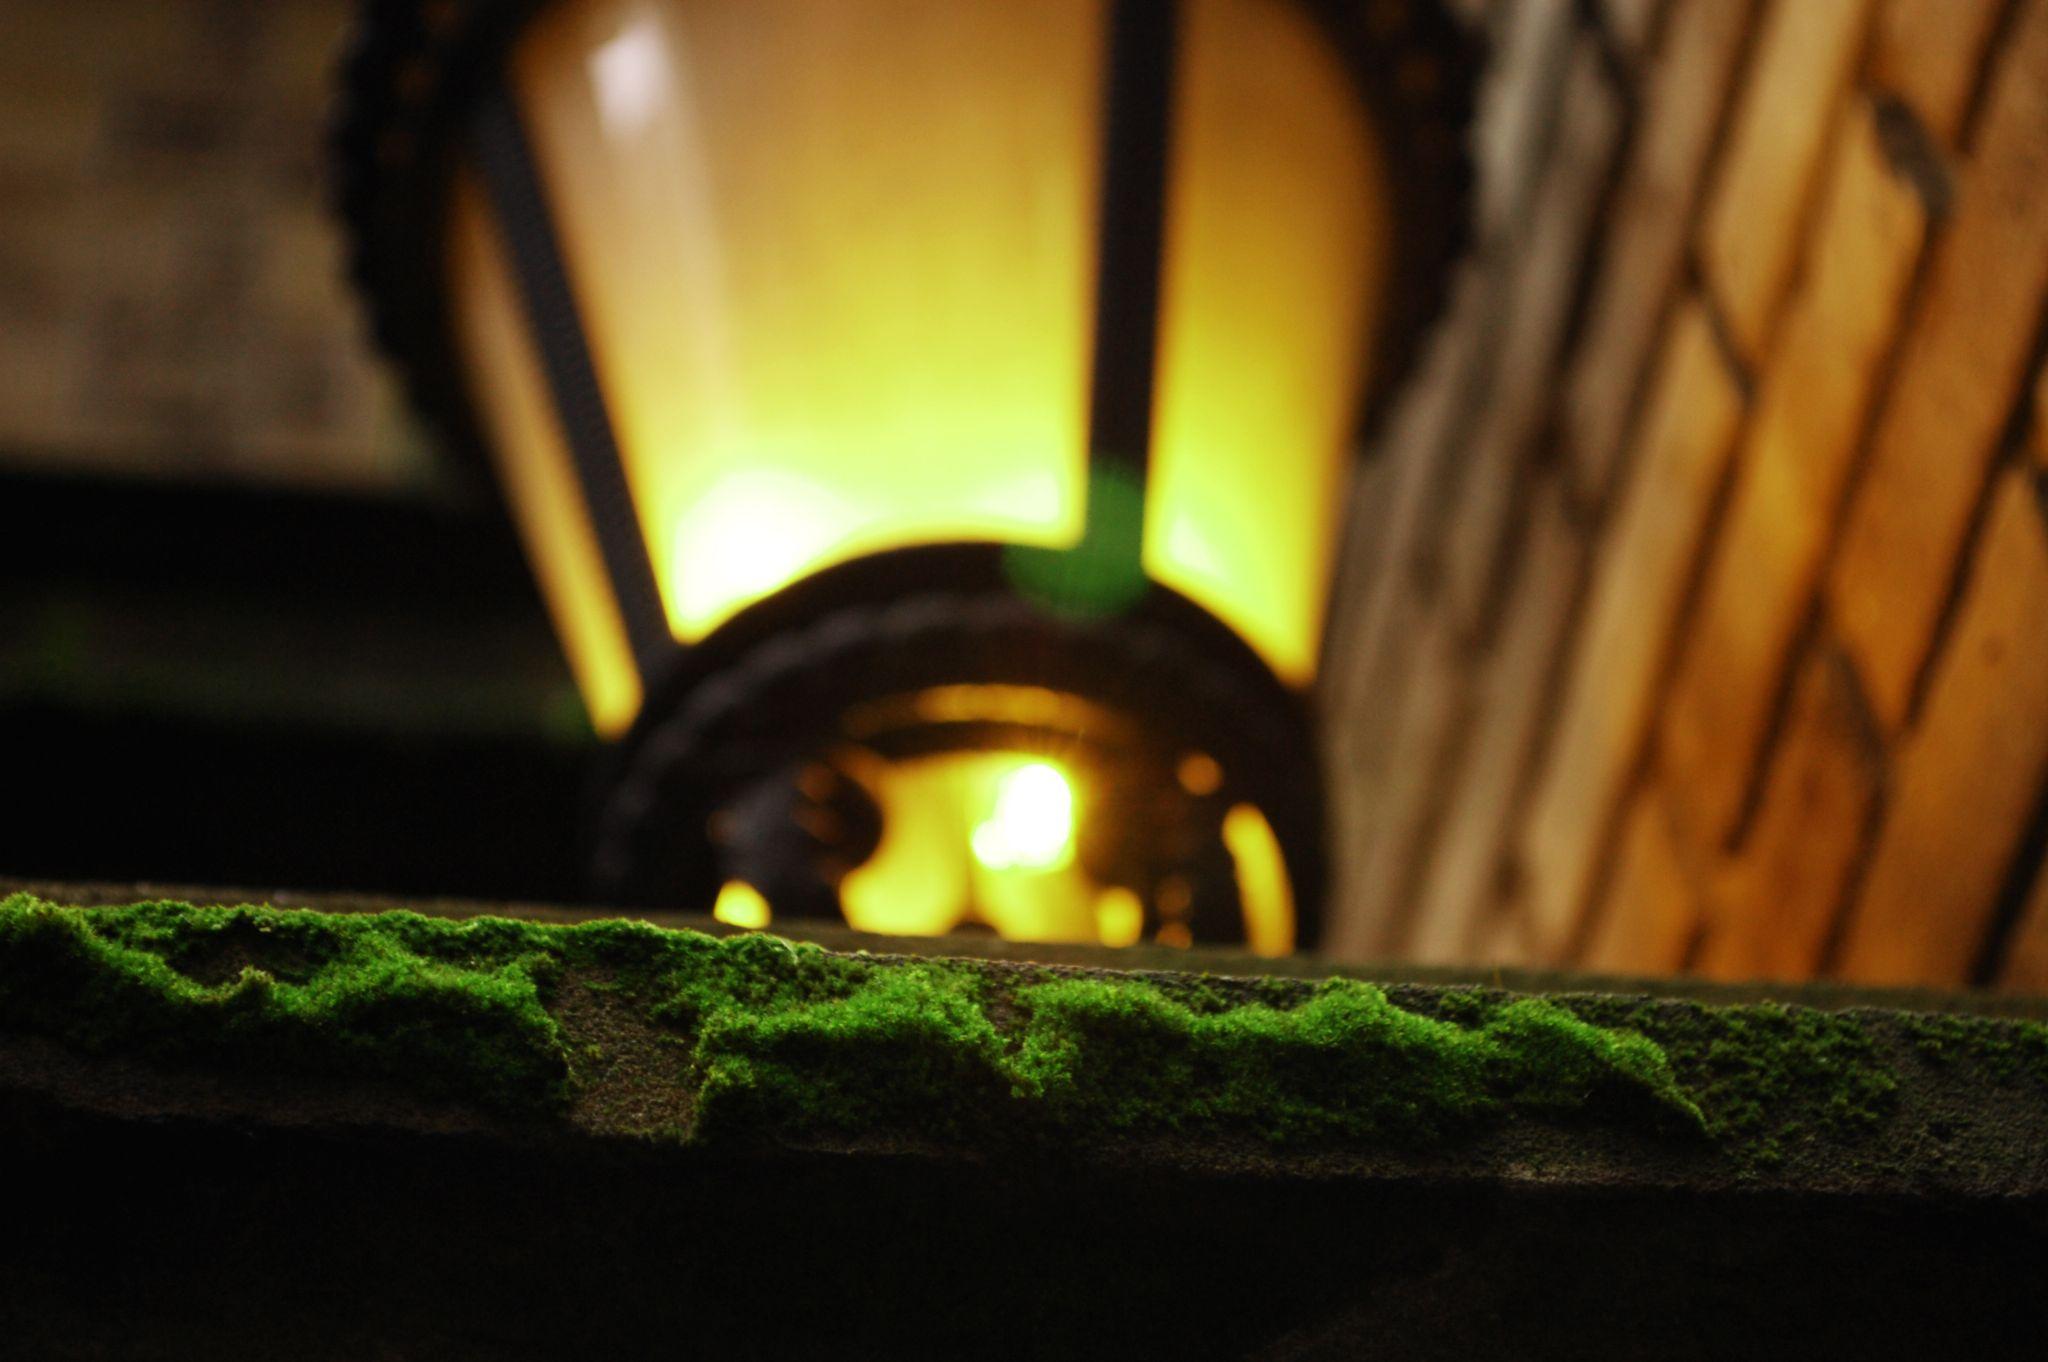 Moss and street lamp by Yoko D